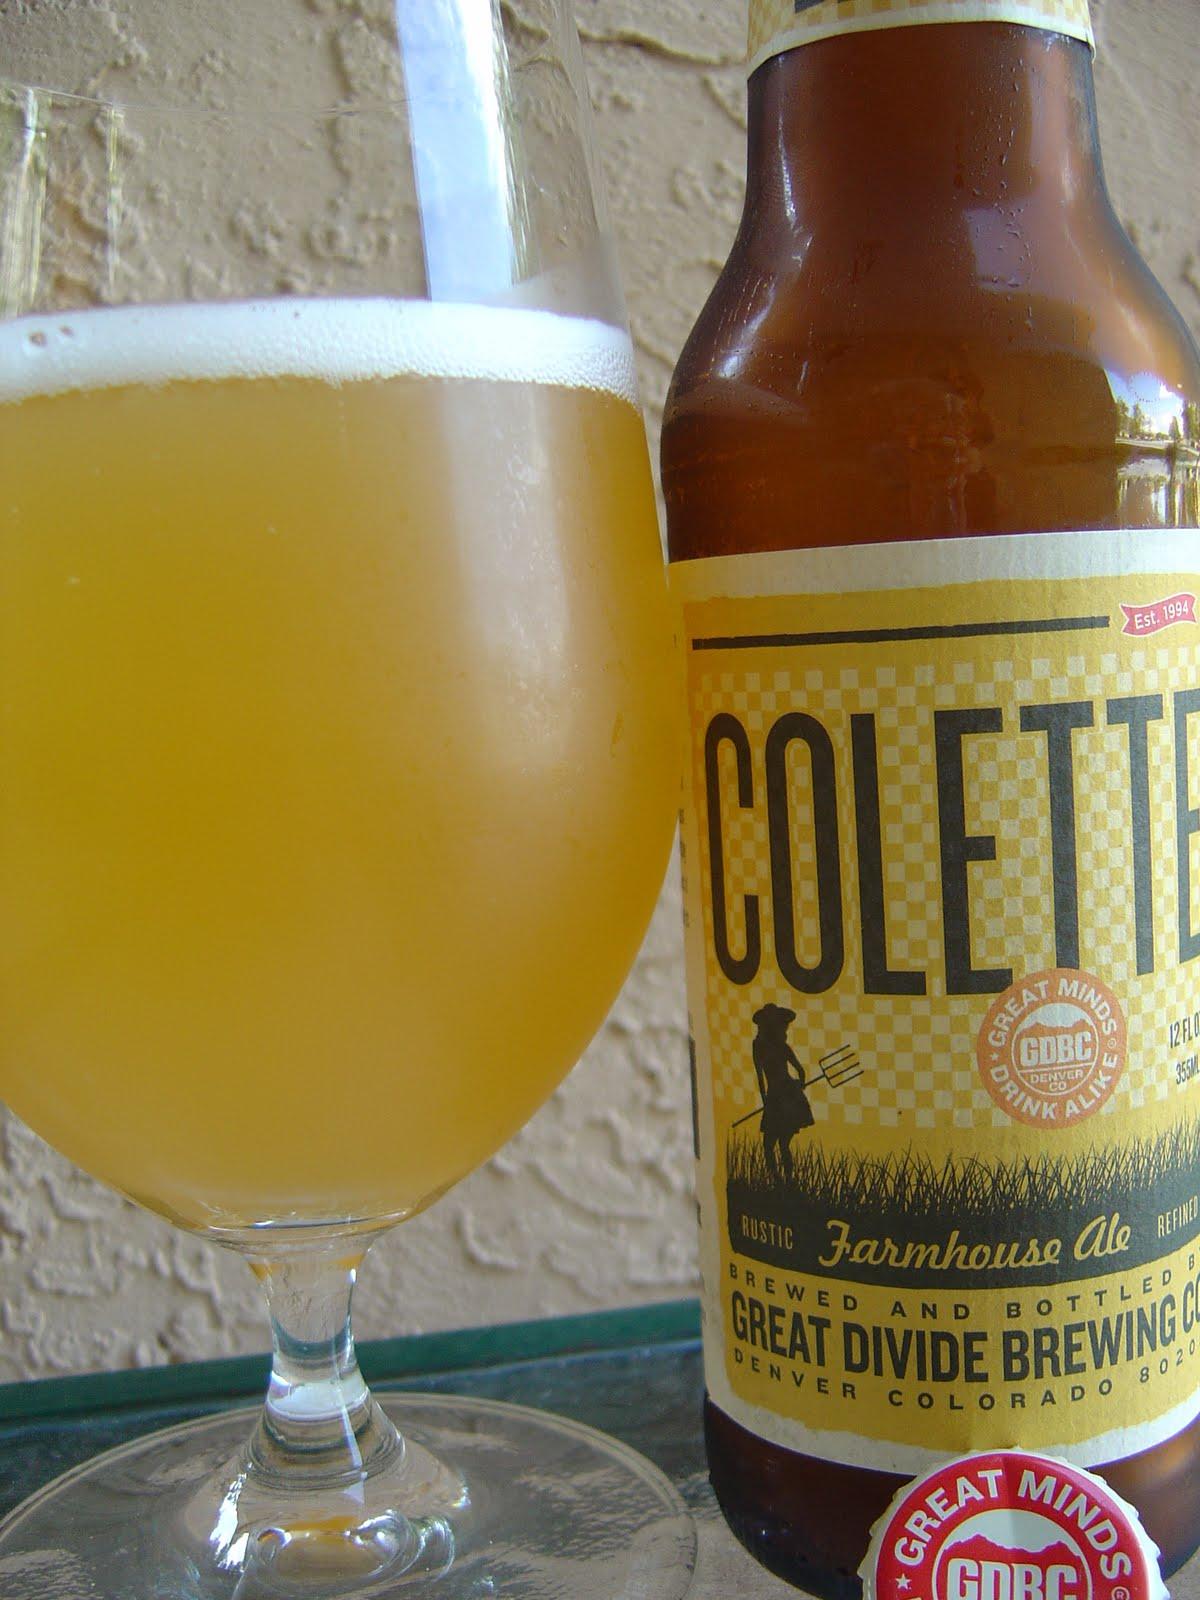 cd0d10af10 Colette Farmhouse Ale. Today I m drinking Colette Farmhouse Ale brewed by Great  Divide Brewing Company ...